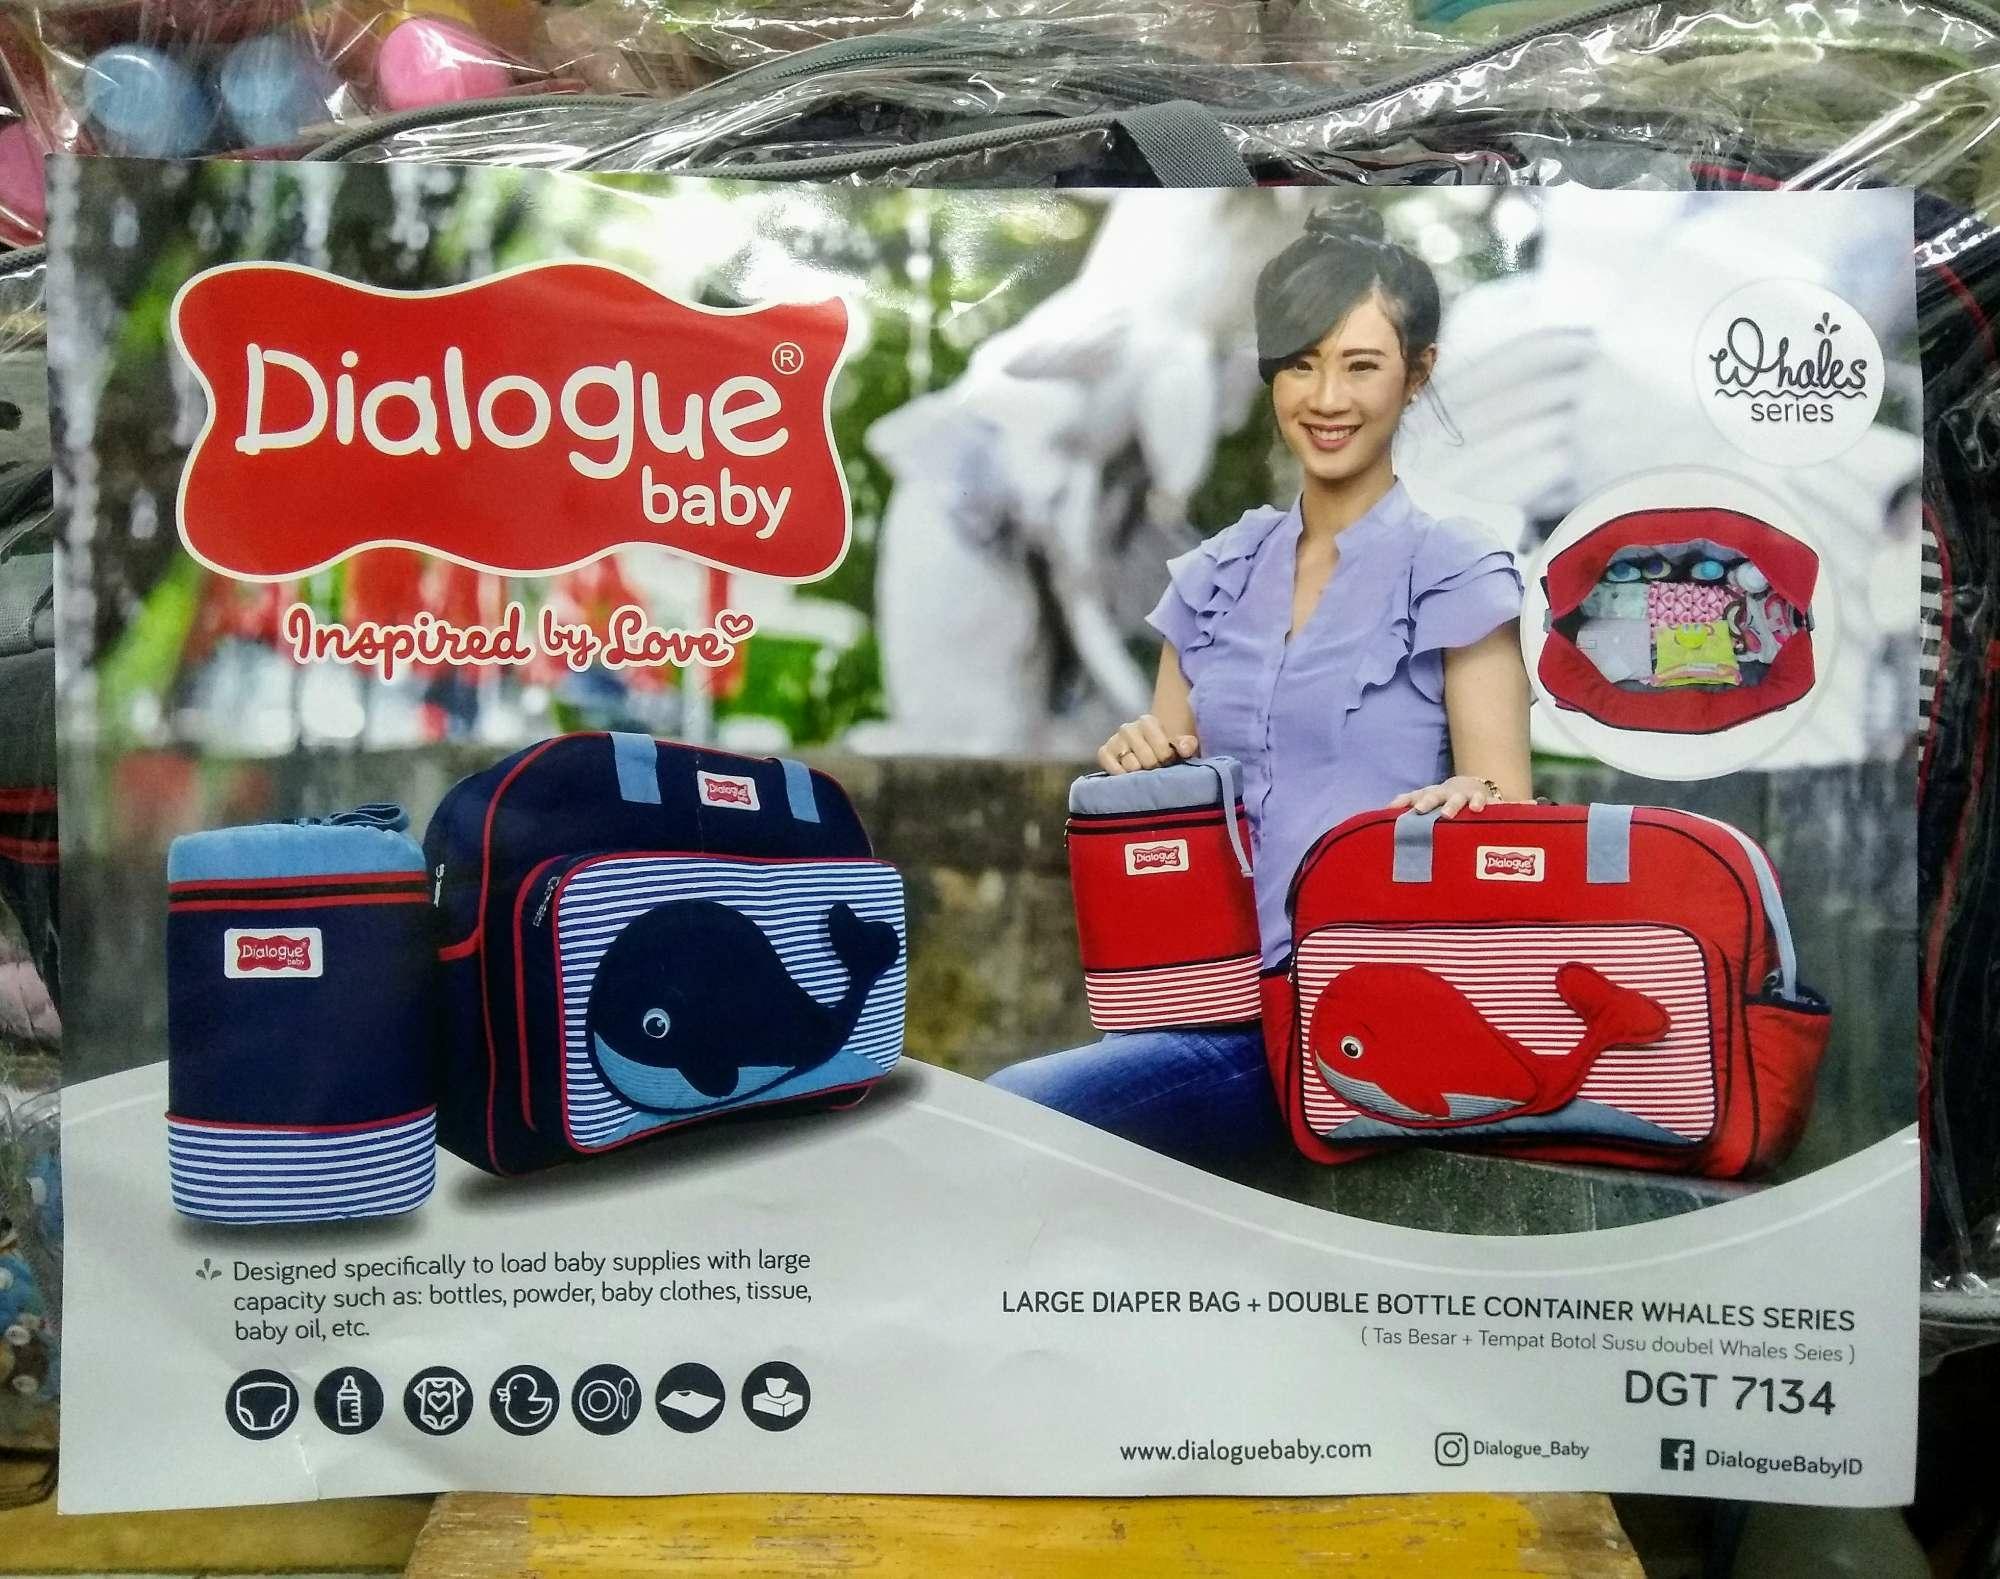 Tas besar + Tempat botol susu double whale series Dialogue Baby